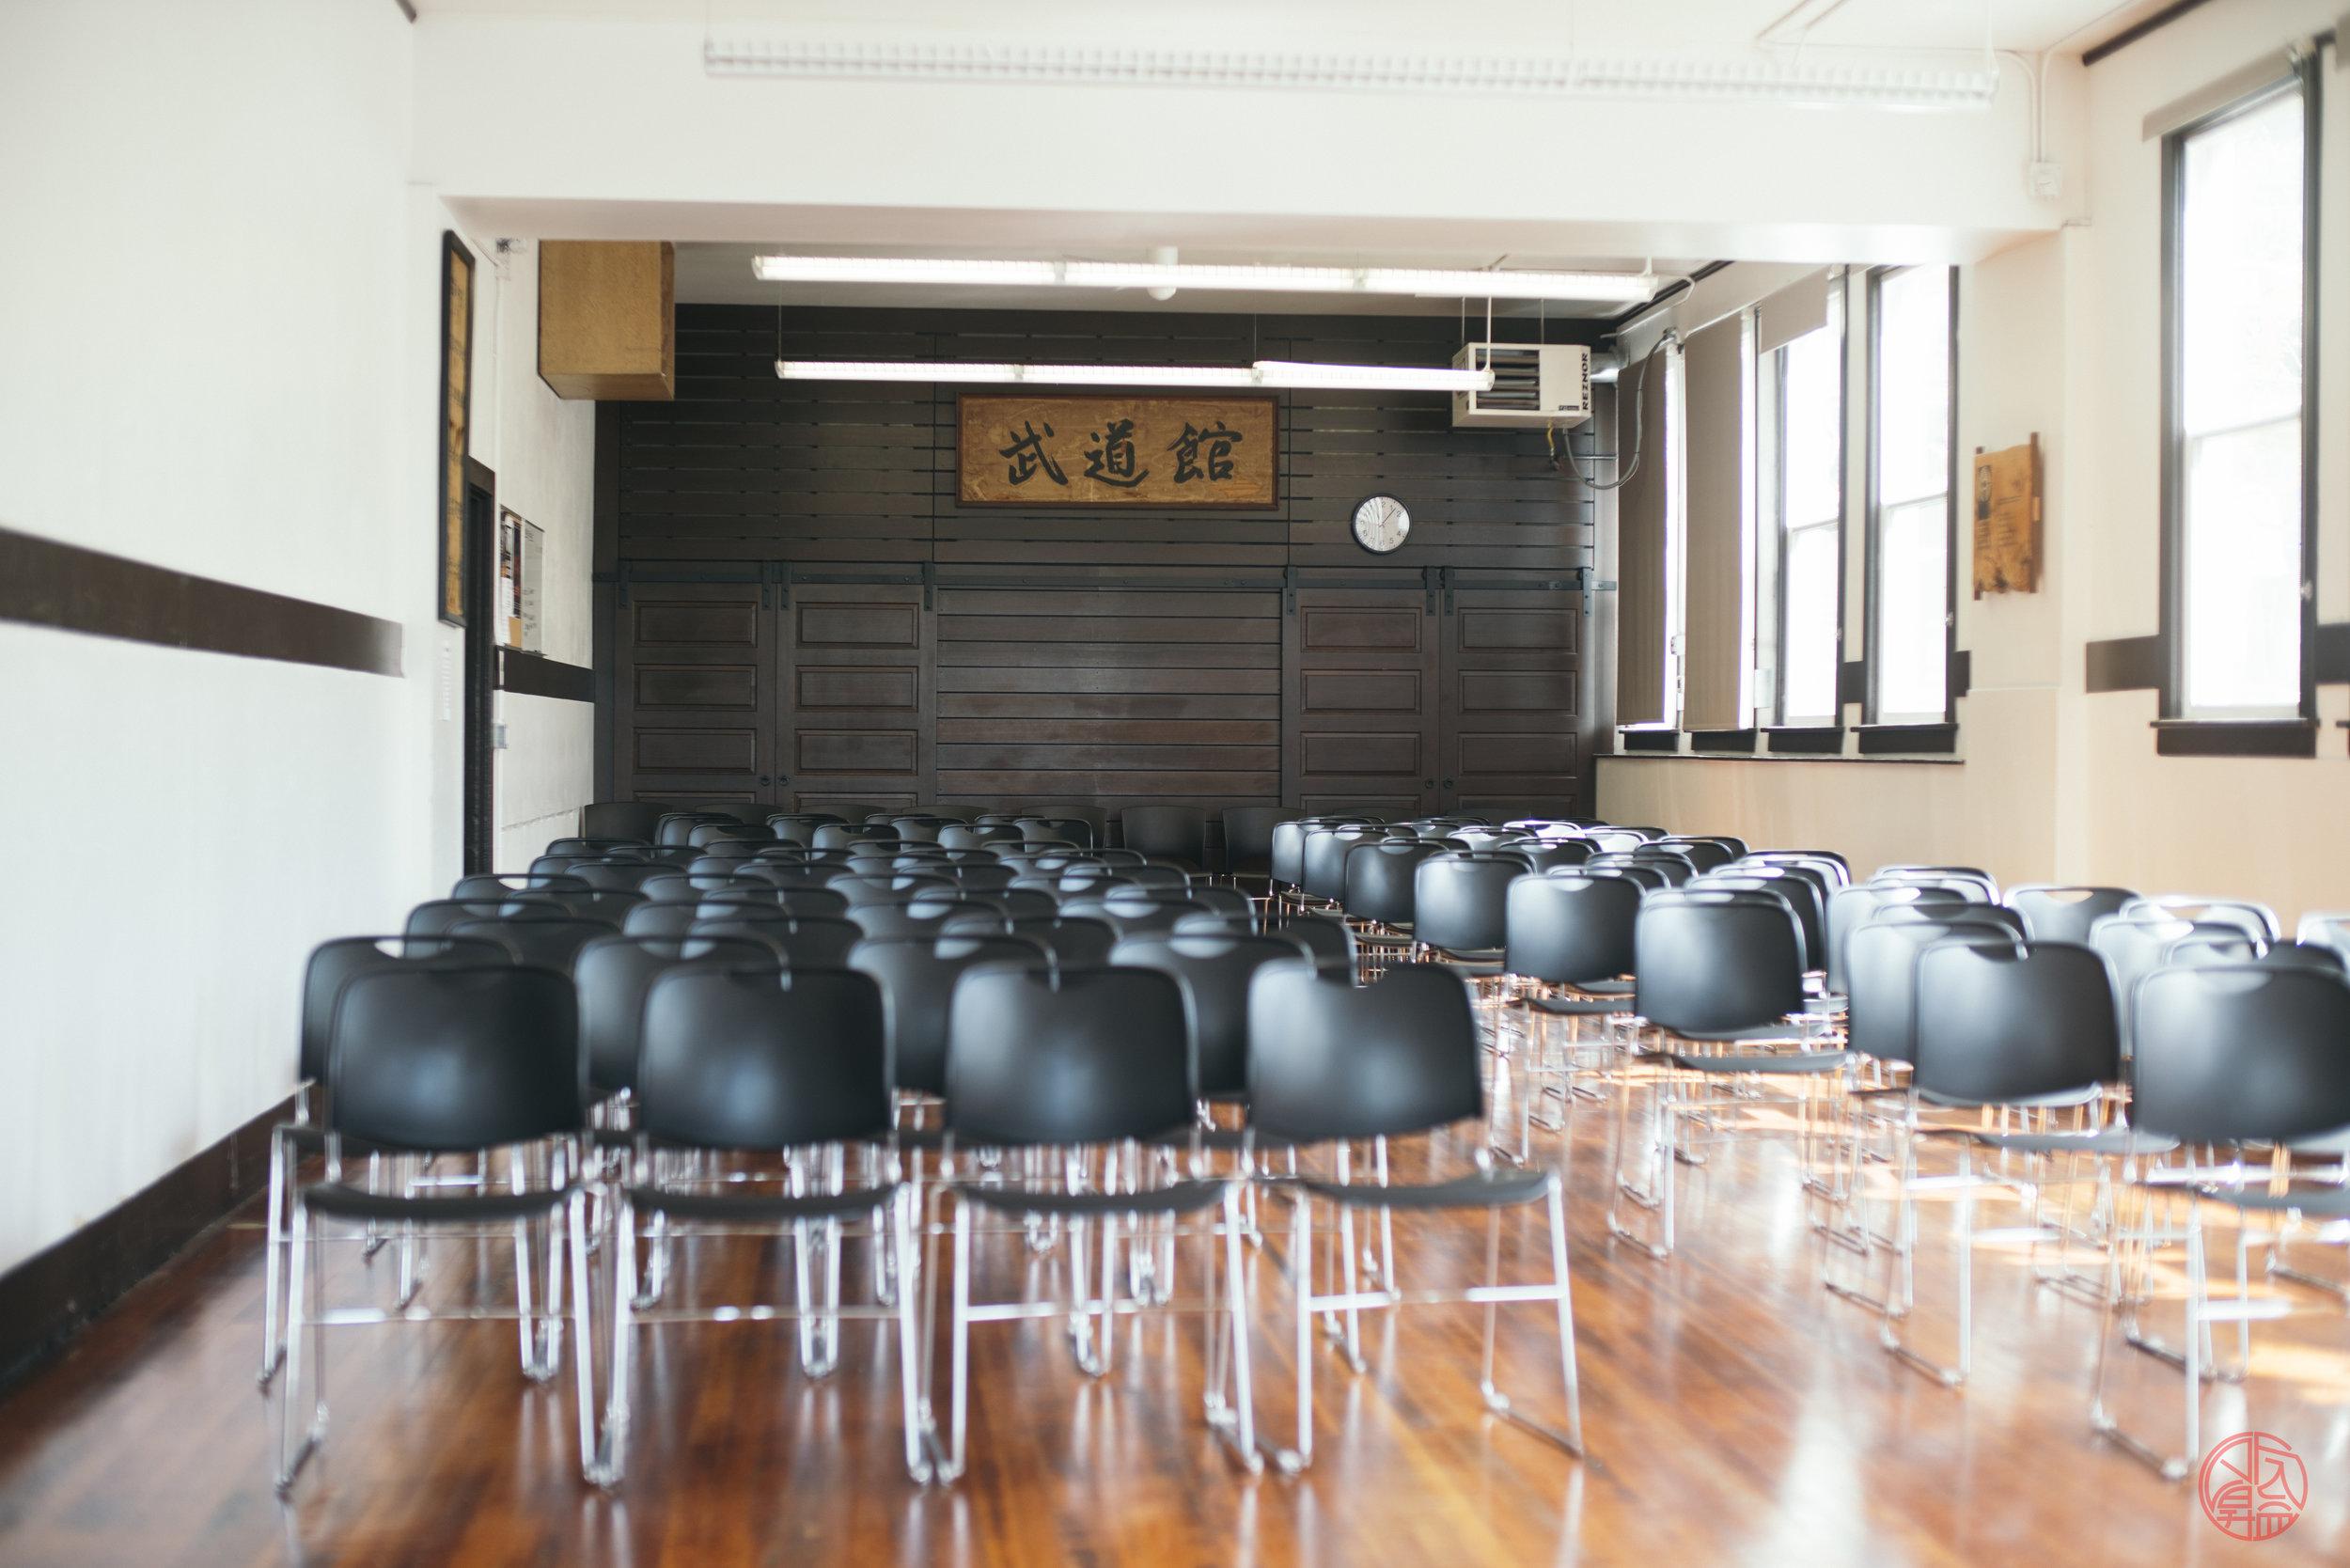 jcccw-seattle-japanese-rental-facility-1.jpg